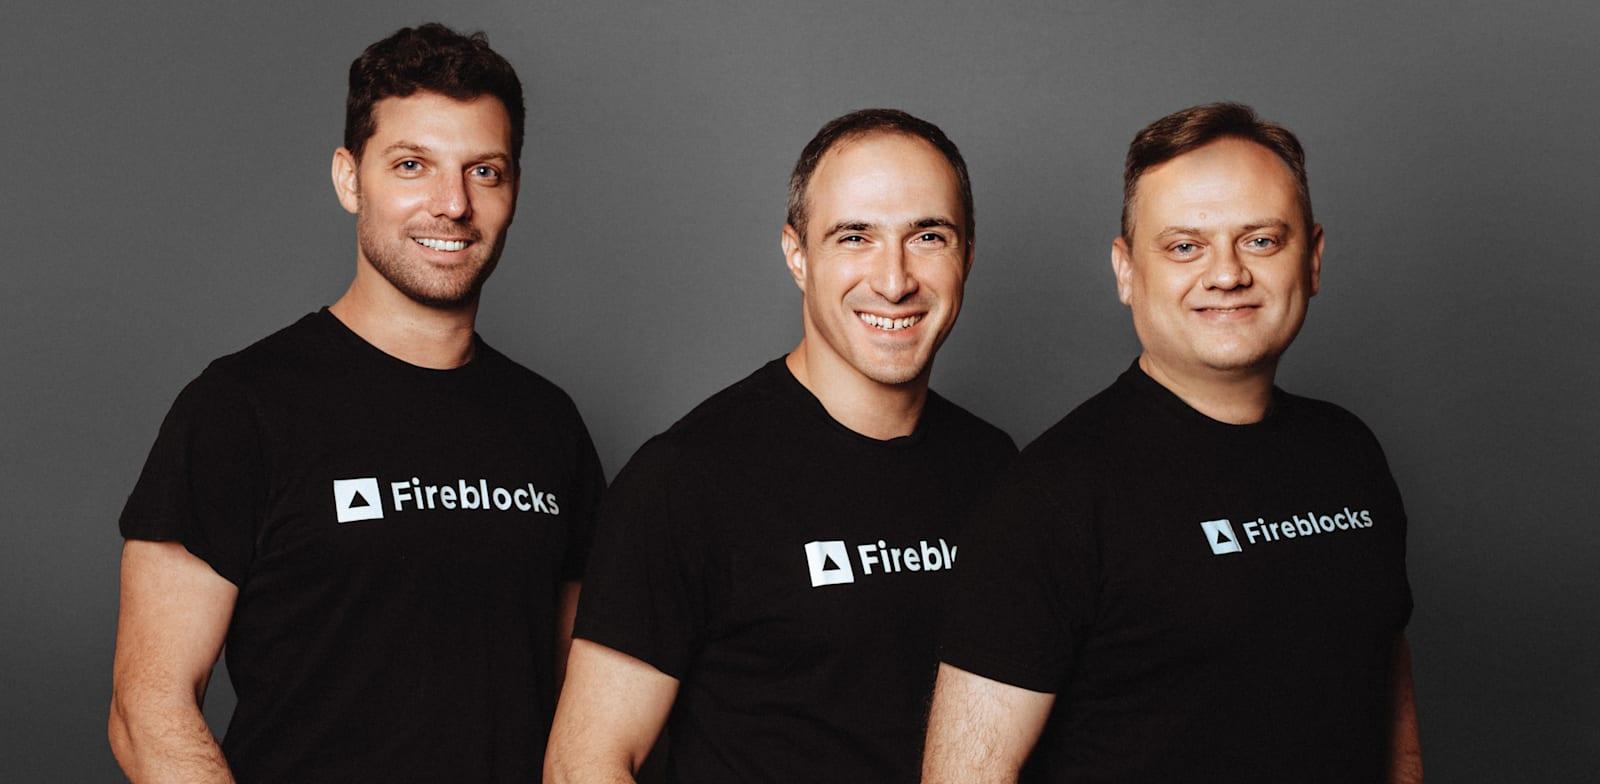 Fireblocks founders Idan Ofrat, Michael Shaulov, and Pavel Berengoltz  credit: PR